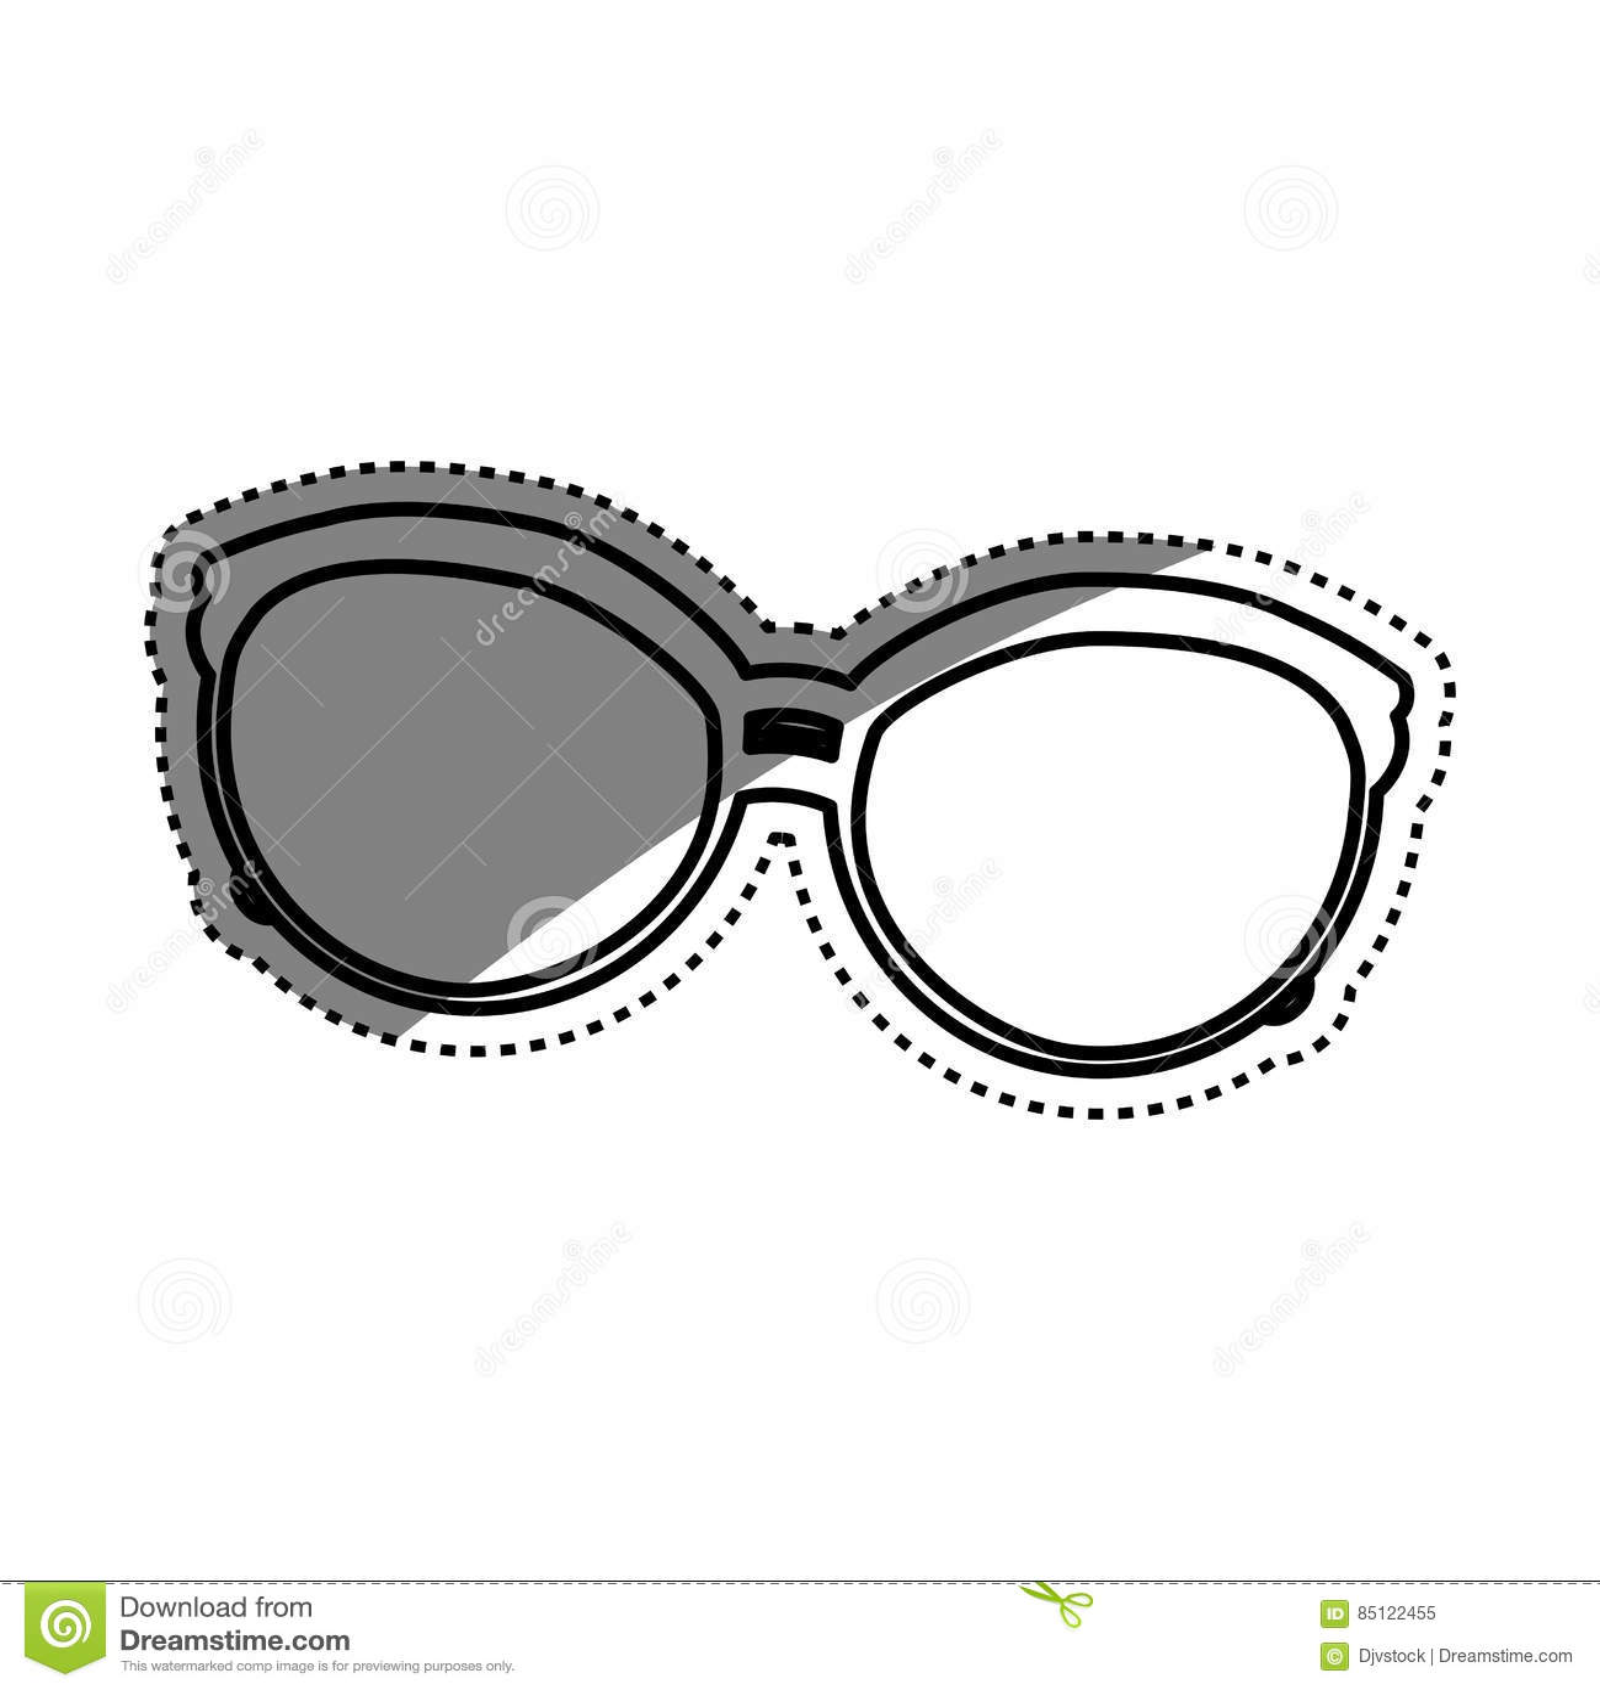 8f761f844398 Vintage fashion glasses icon illustration graphic design. More similar stock  illustrations